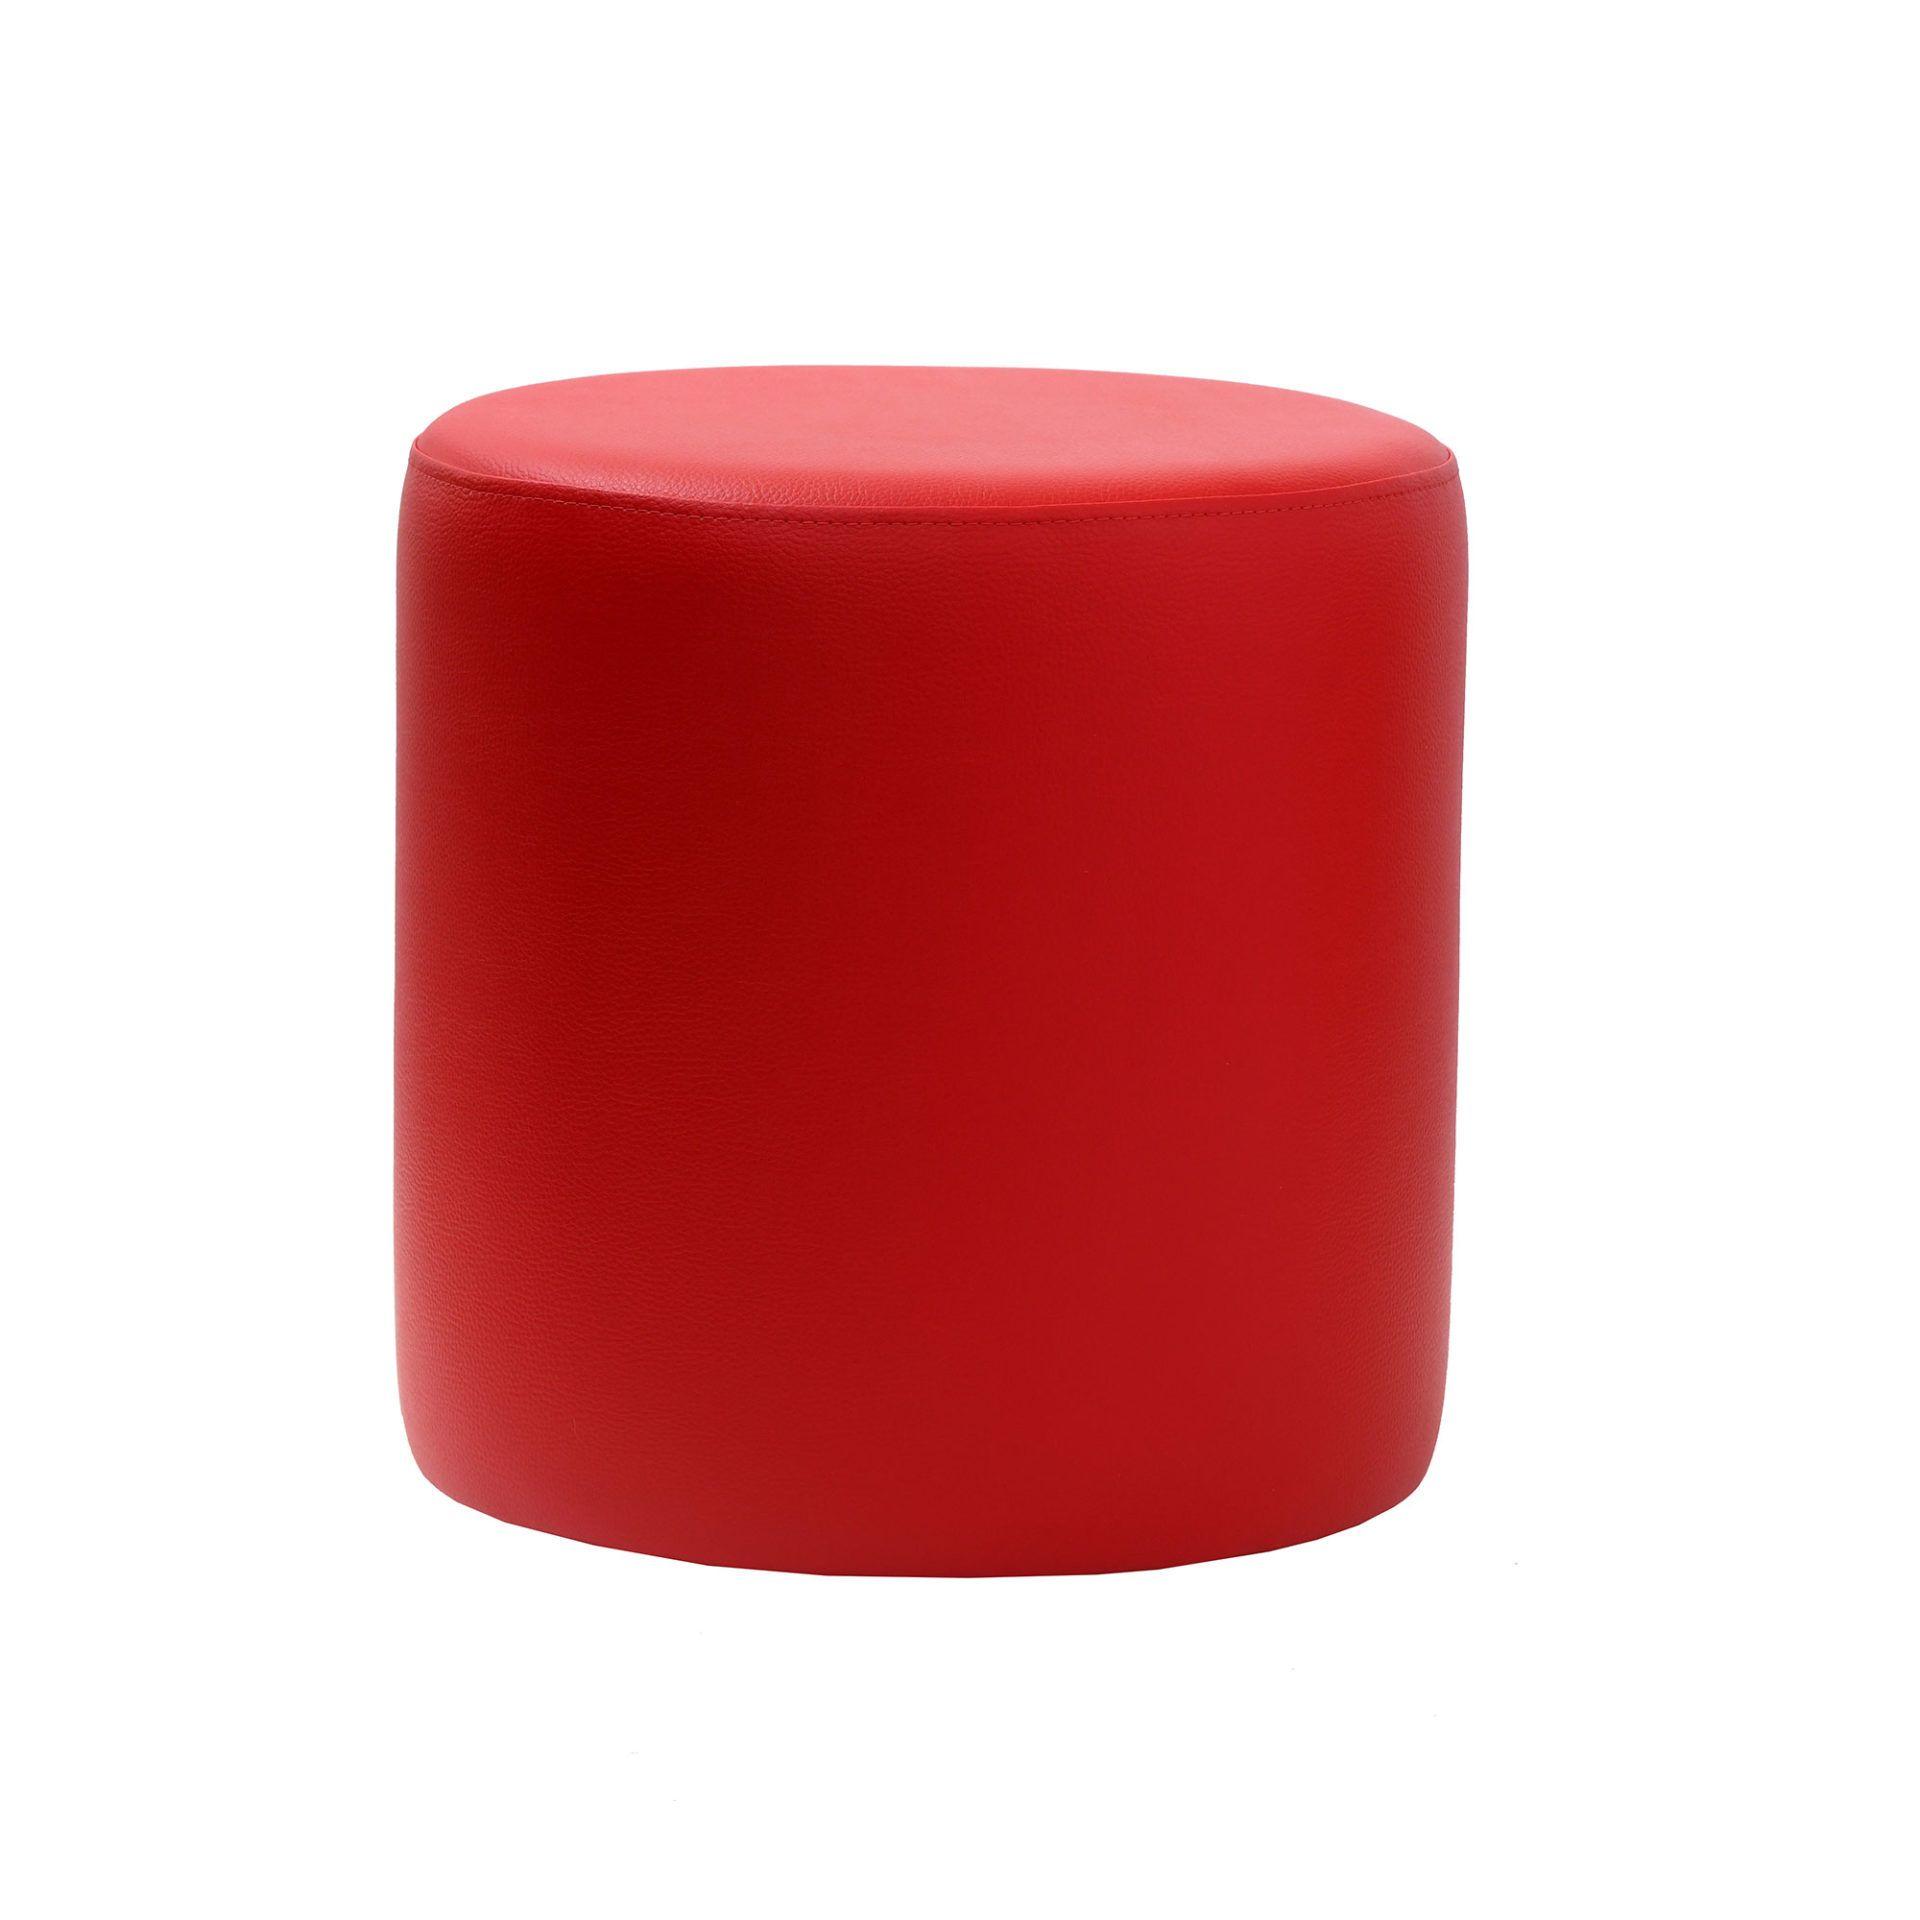 roundottoman red